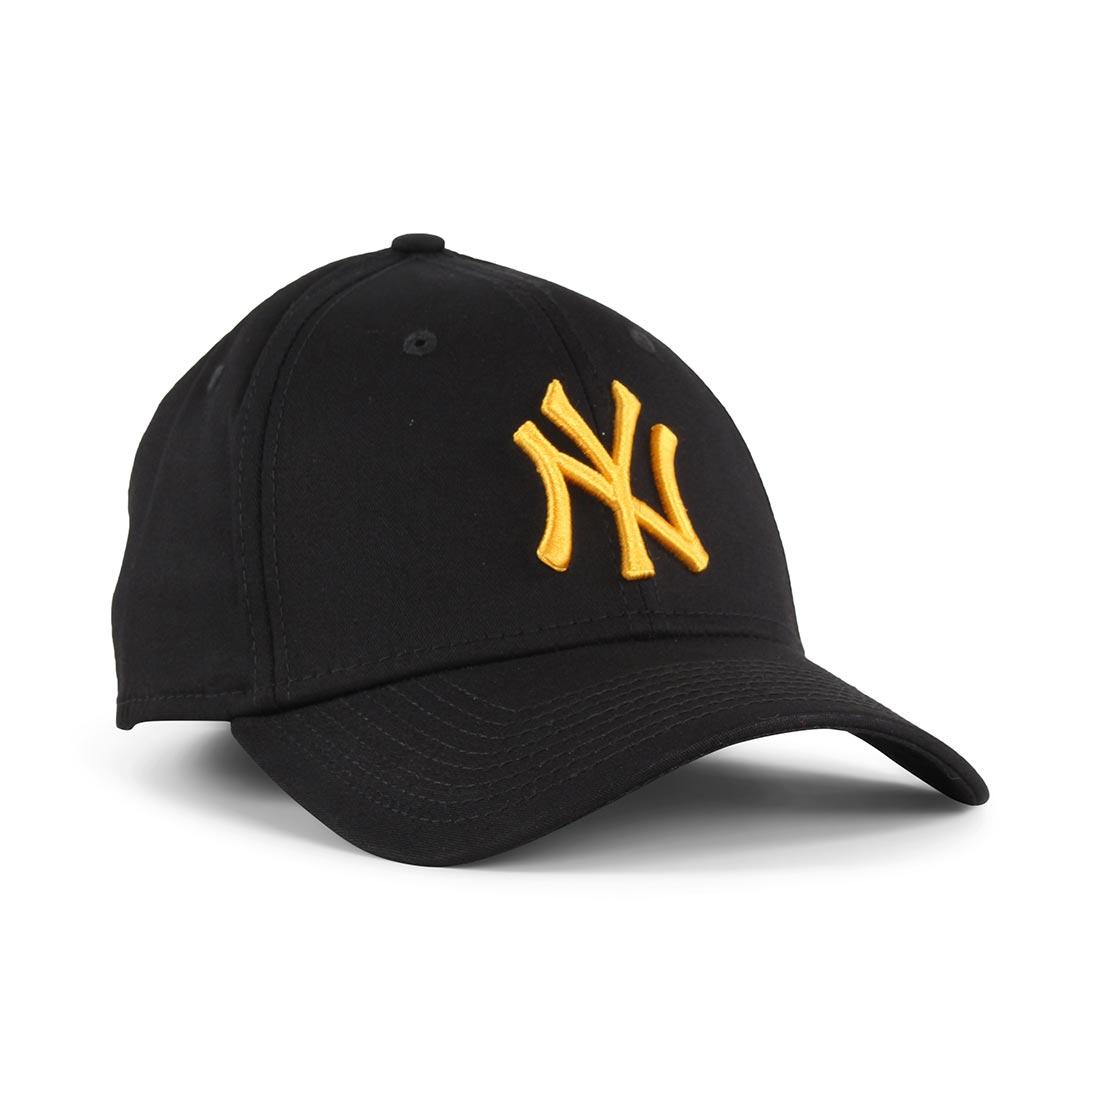 b71404176787d New Era NY Yankees League Essential 39Thirty Cap – Black / Rose Gold